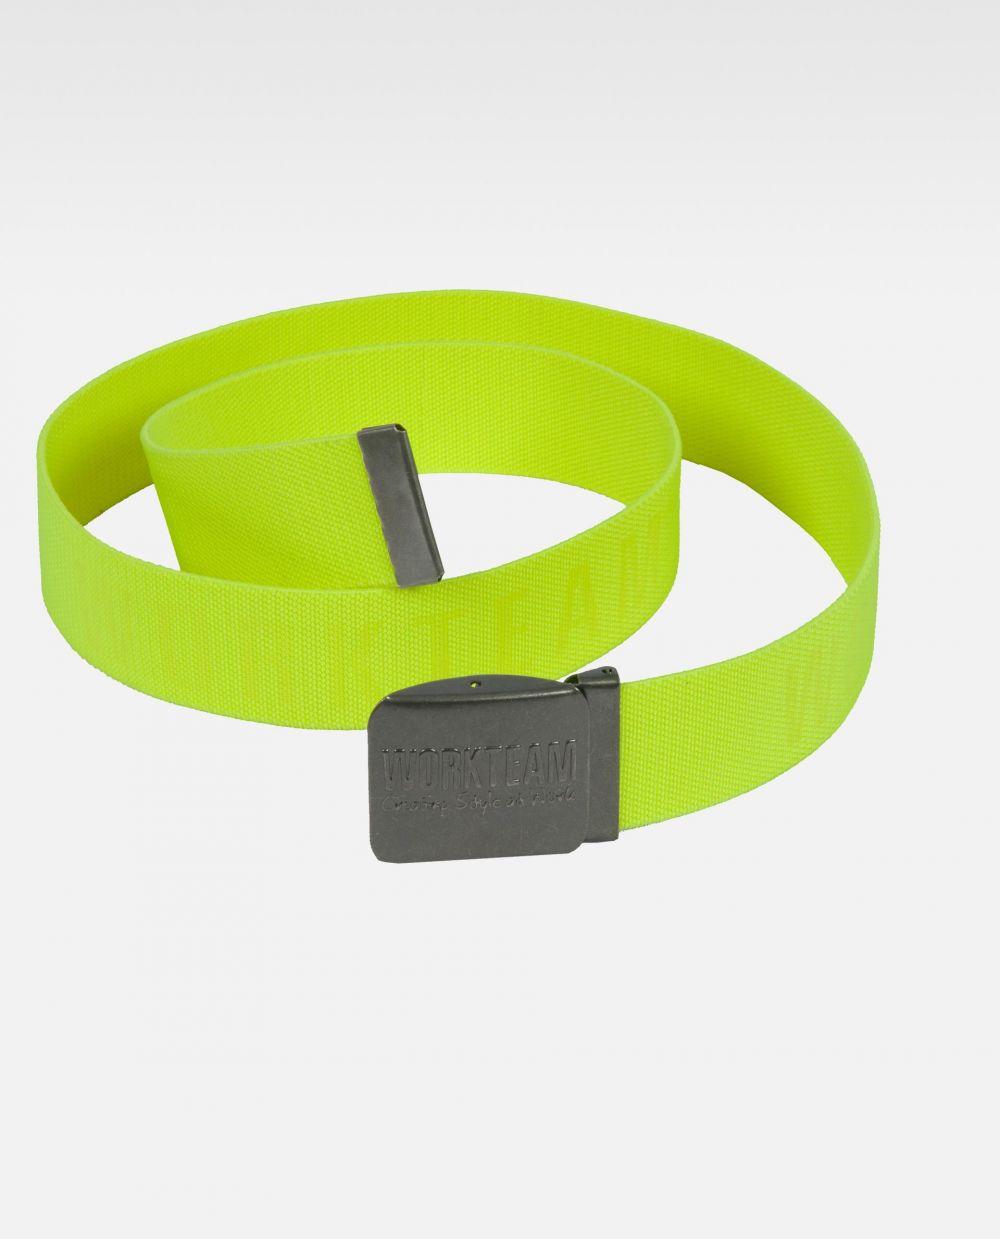 Complementos de industria workteam cinturon wfa501 de poliéster vista 1